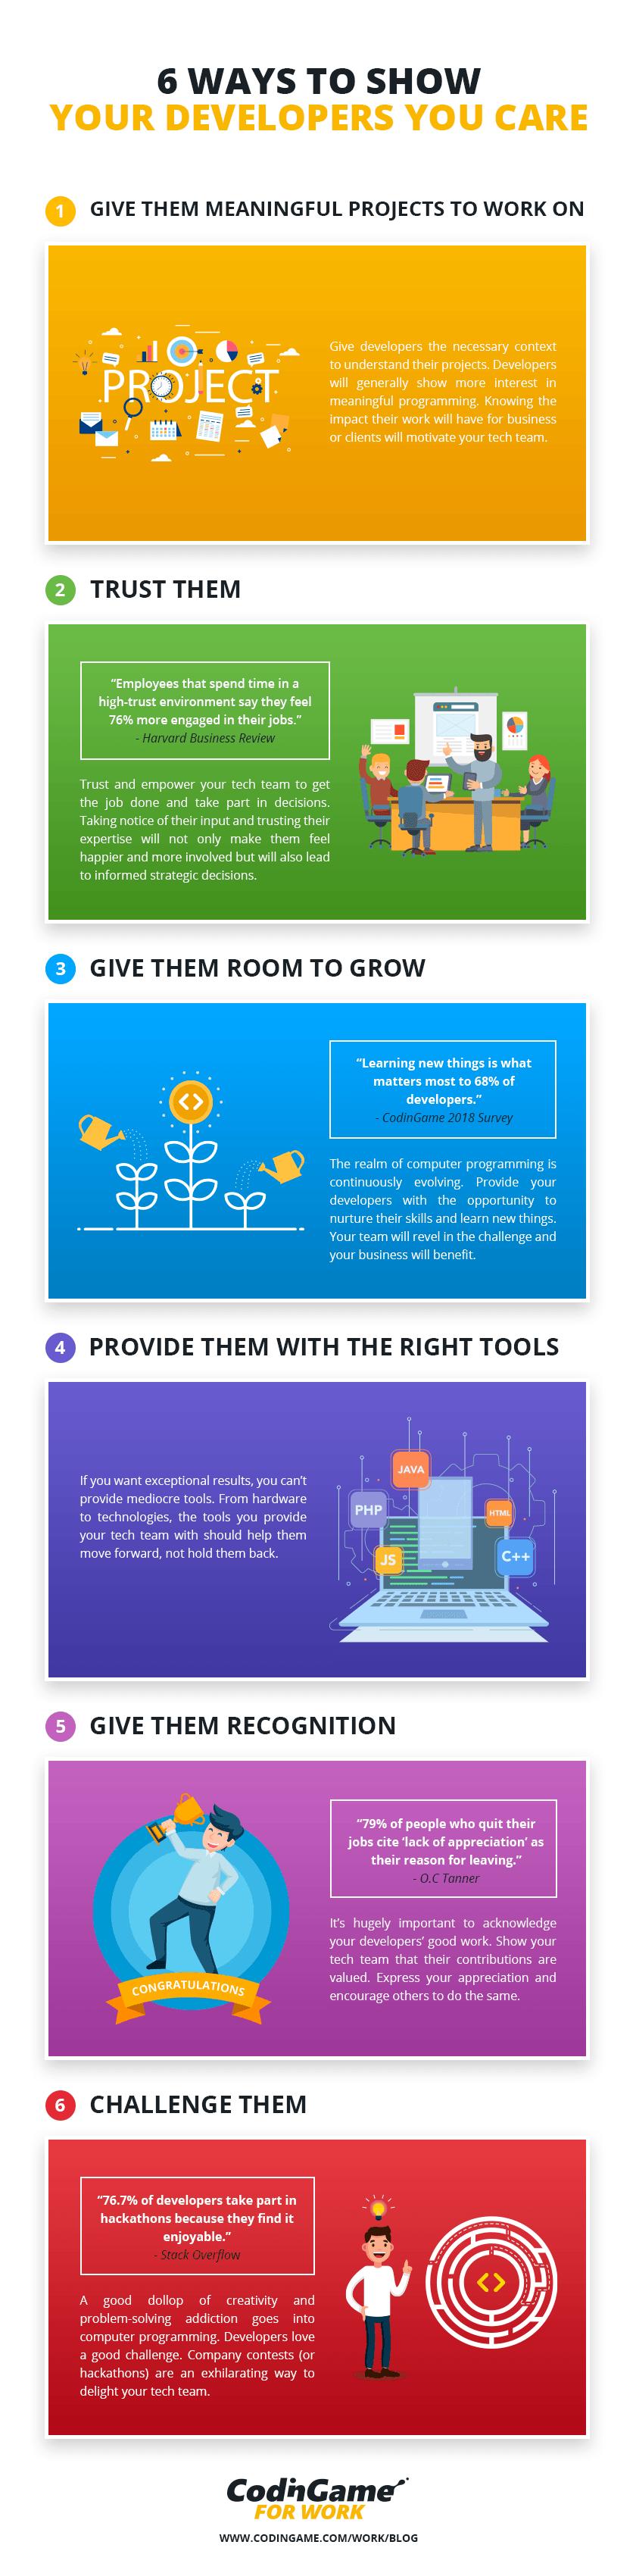 CodinGame developer retention infographic